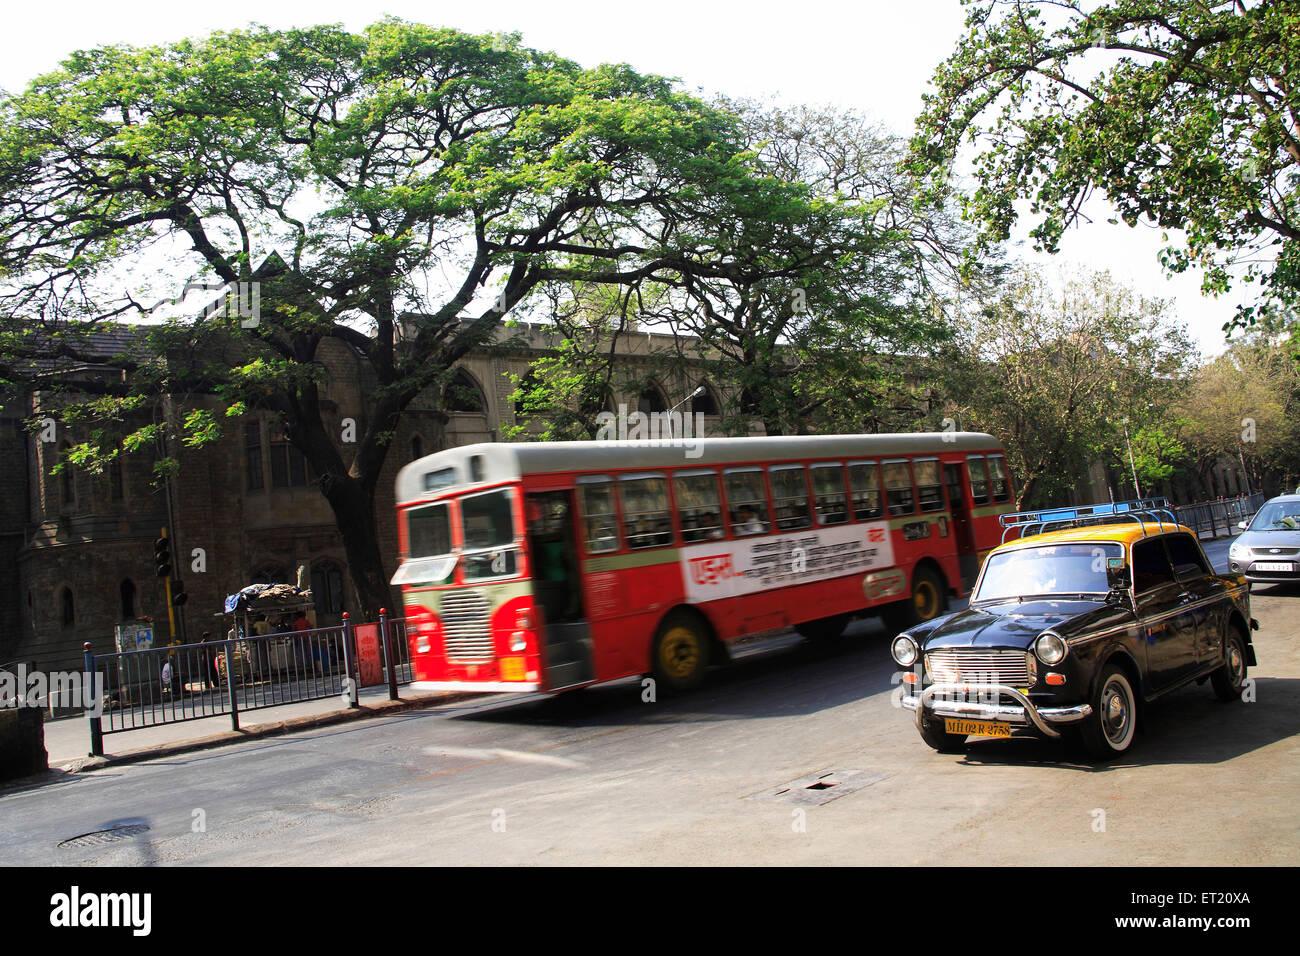 BEST bus and taxi ; Bombay Mumbai ; Maharashtra ; India - Stock Image